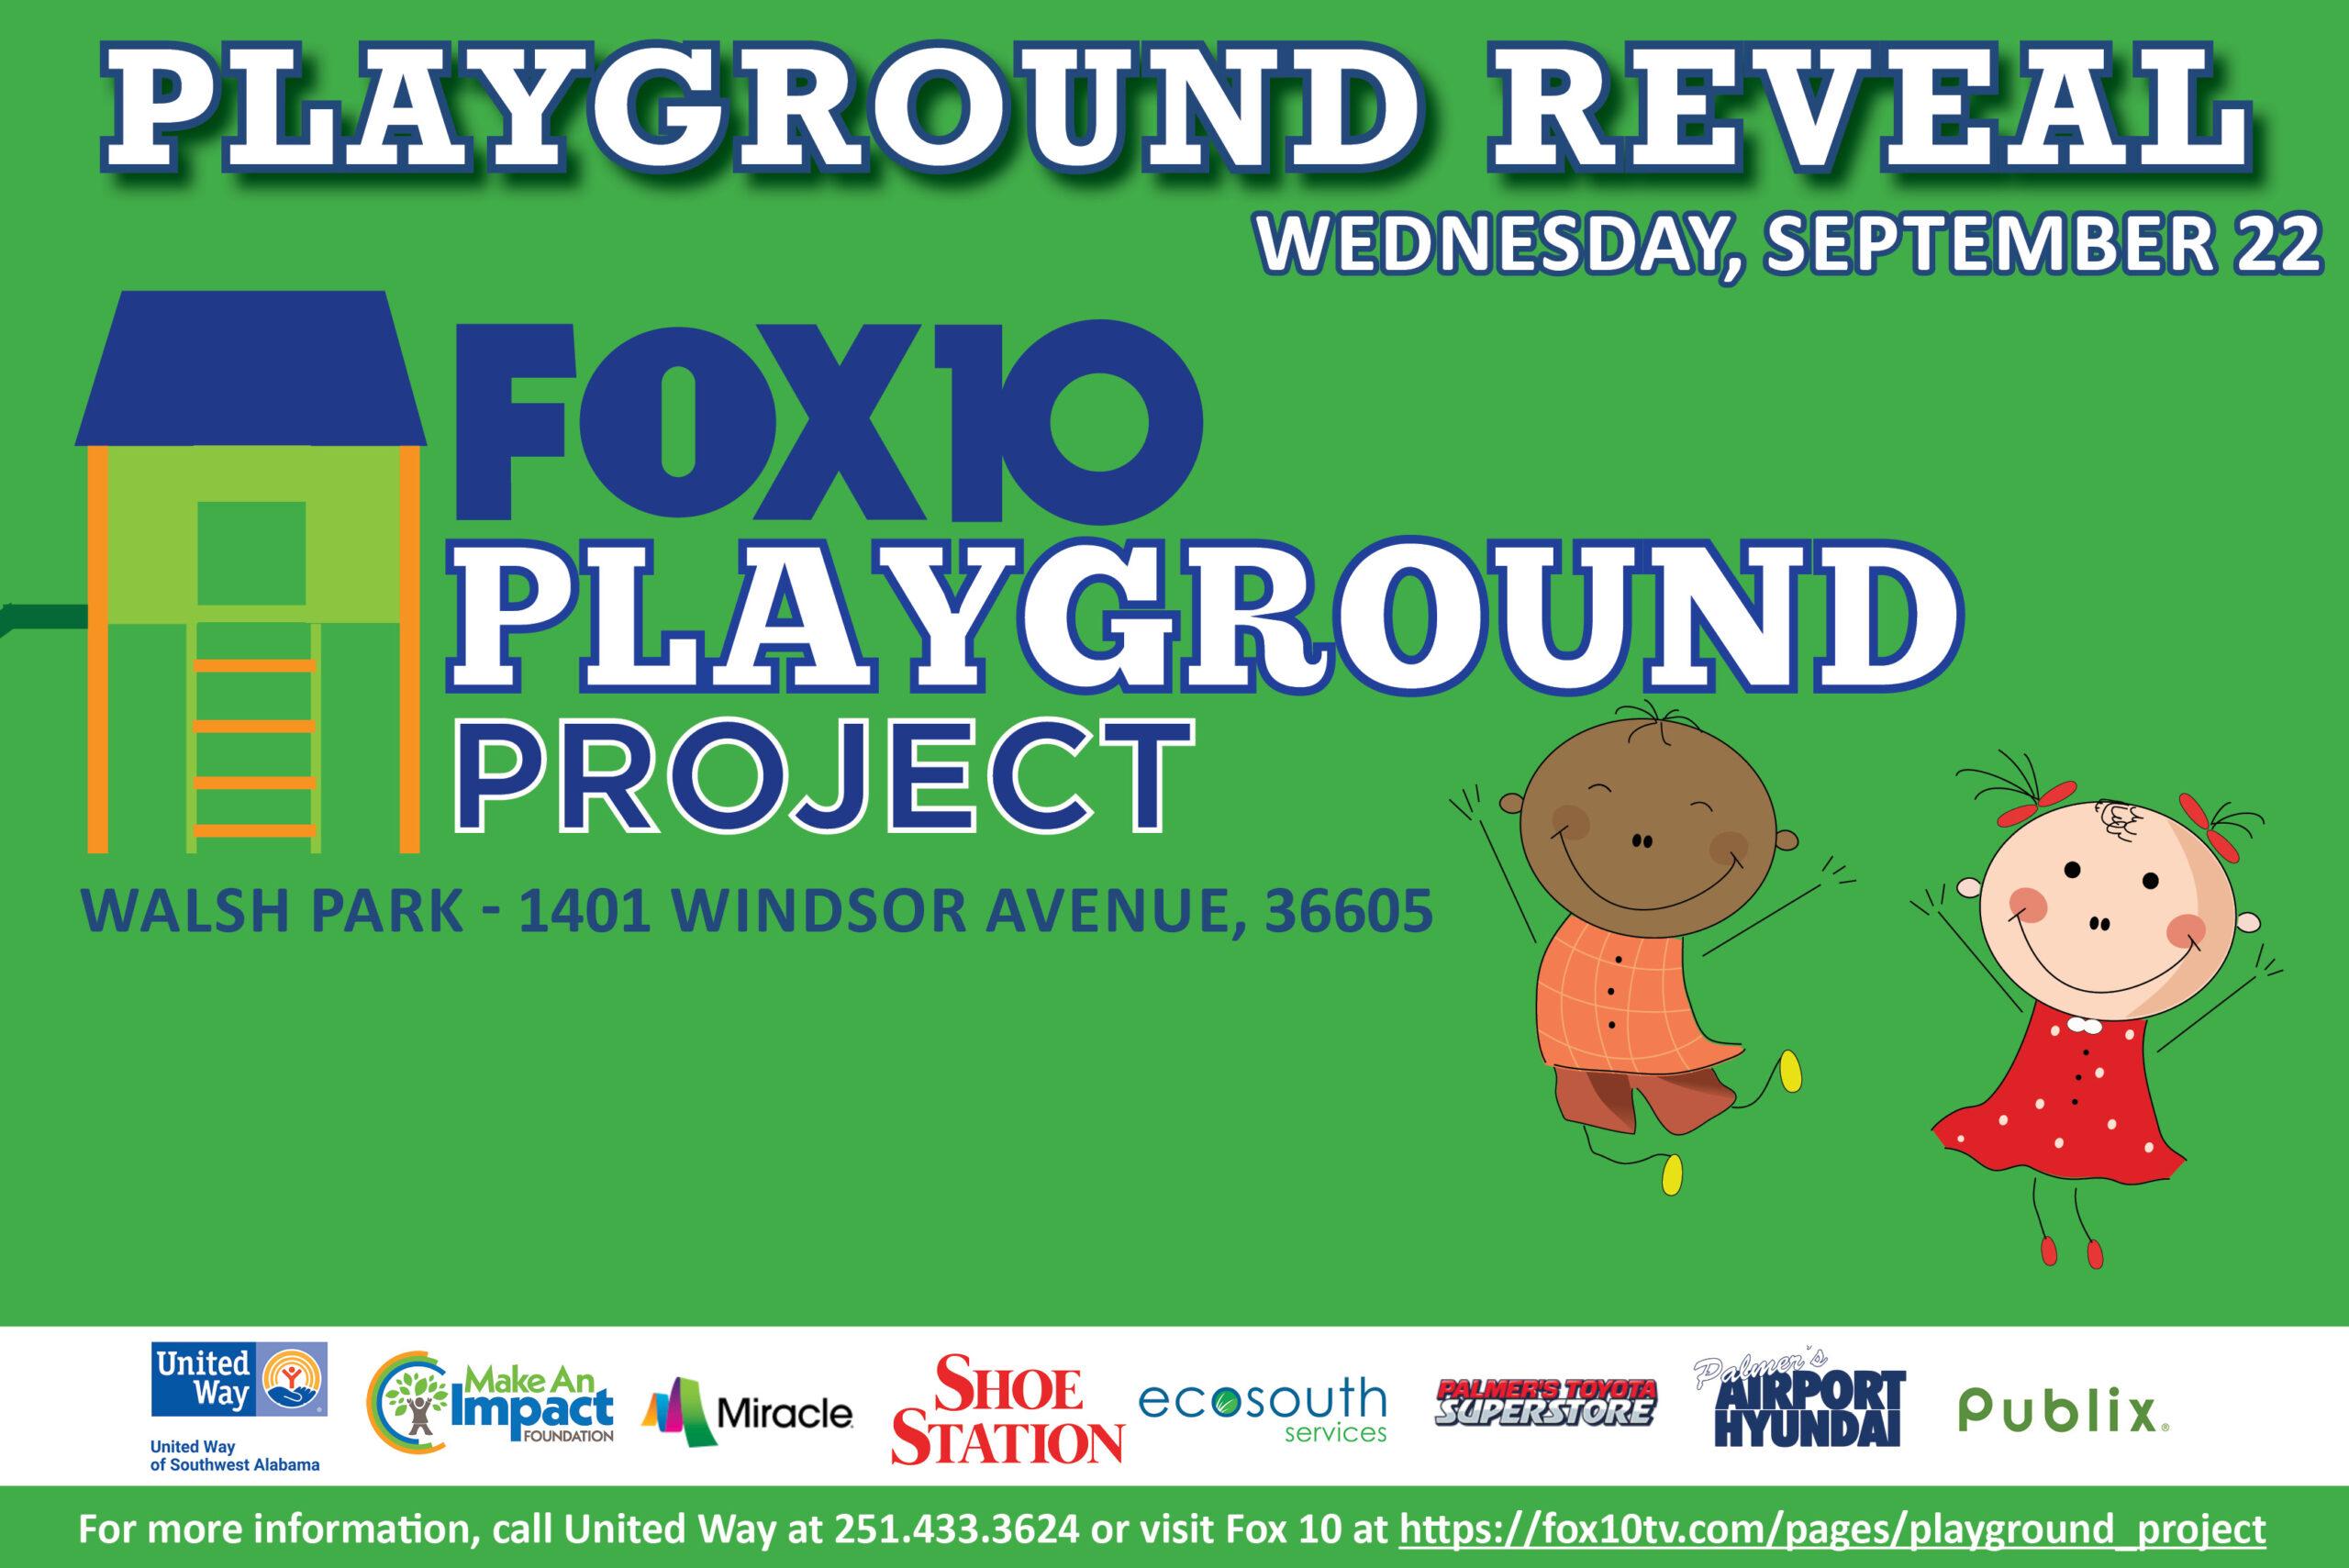 Walsh Park Playground Reveal